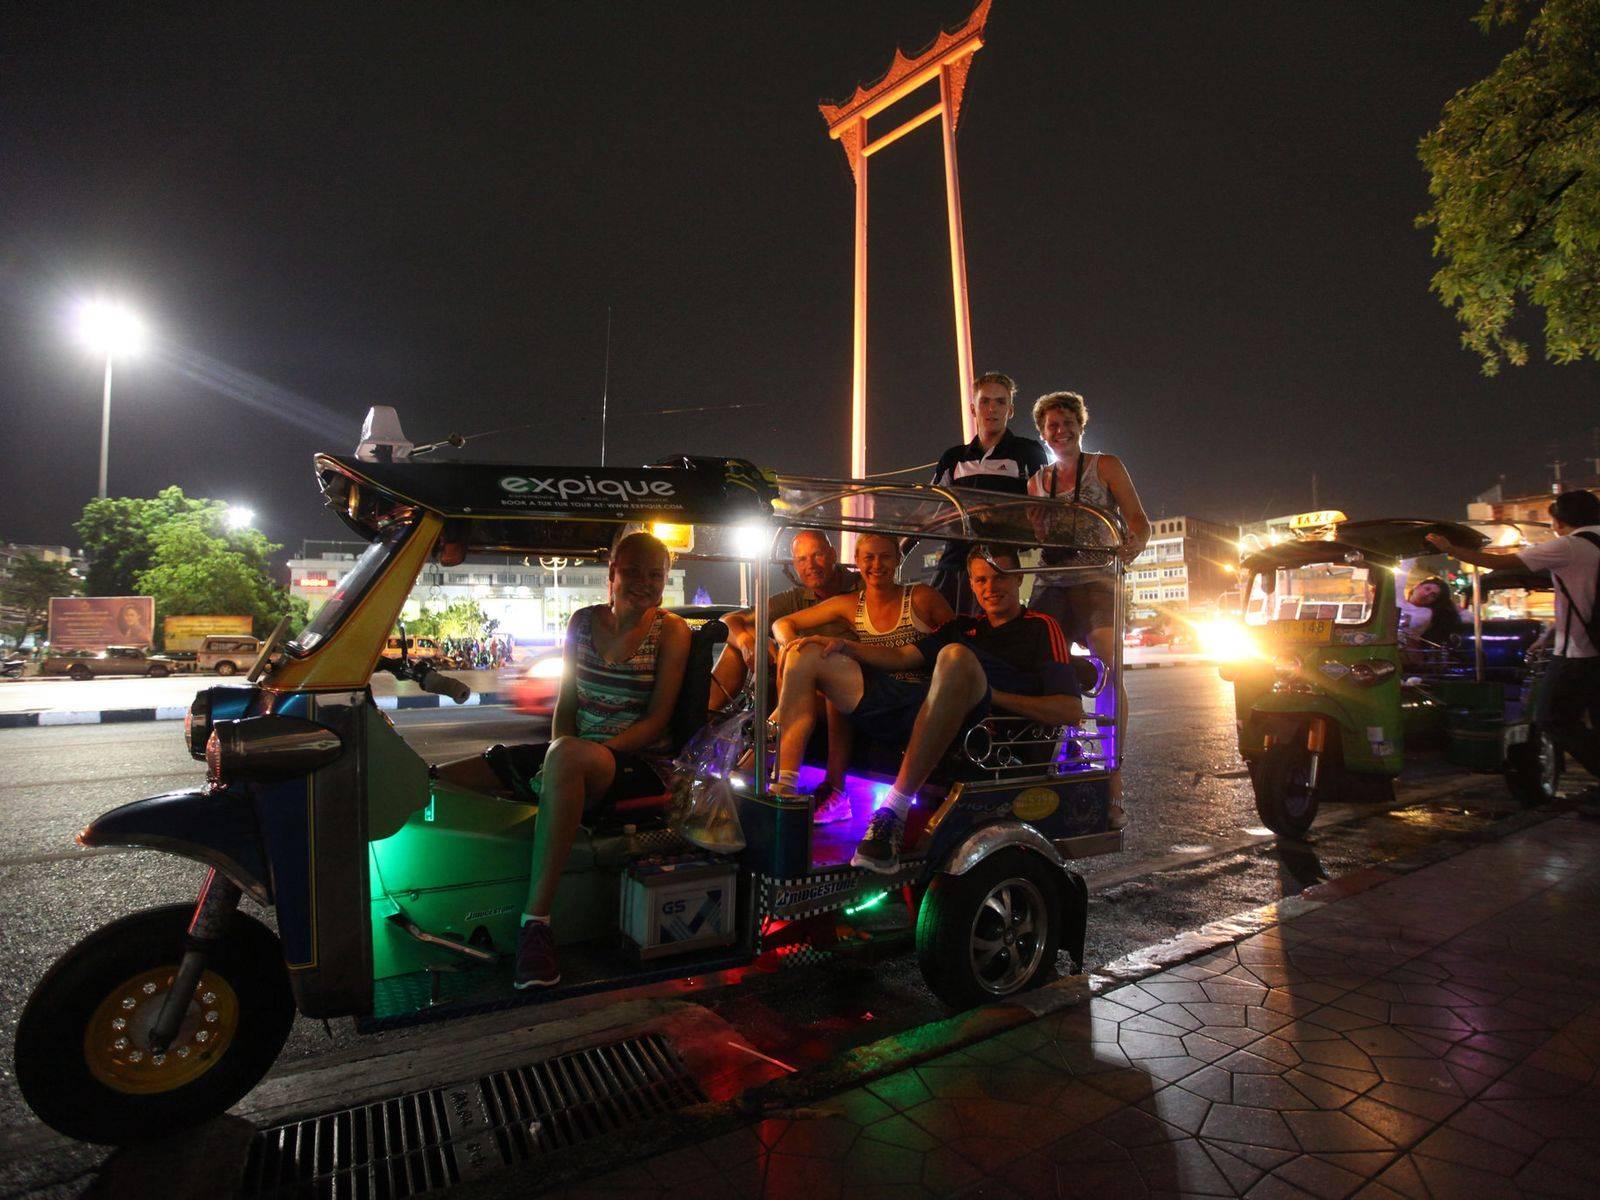 [Joined Tour] Take an Evening Tuk Tuk Tour and See Bangkok at Night